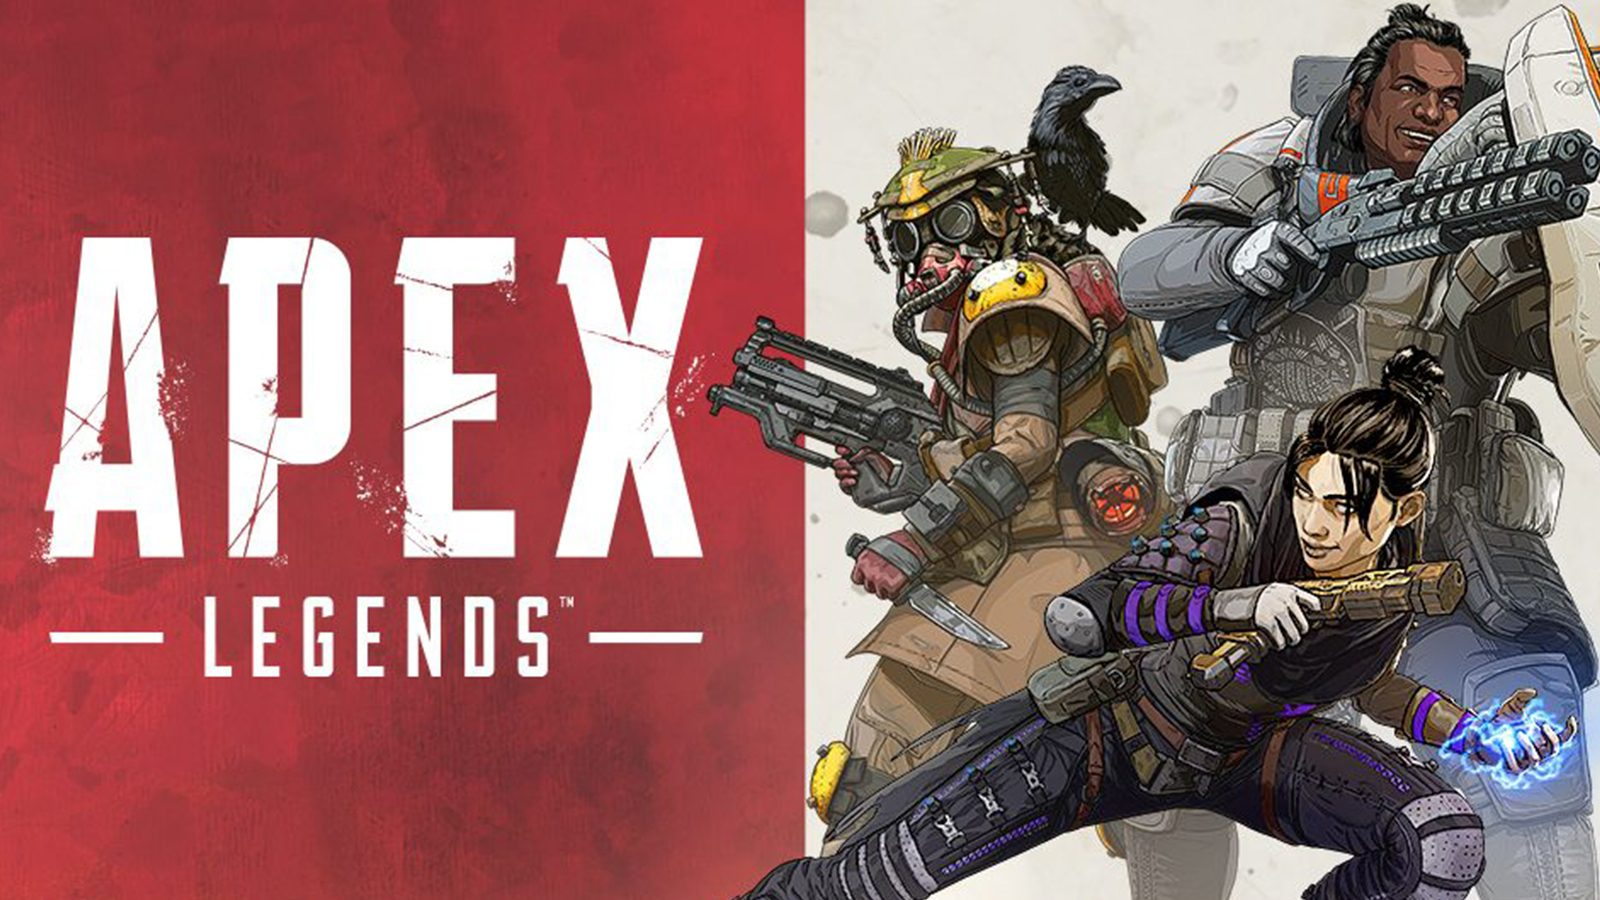 EA确认与国内厂商联手开发《ApexLegends》手游_中国